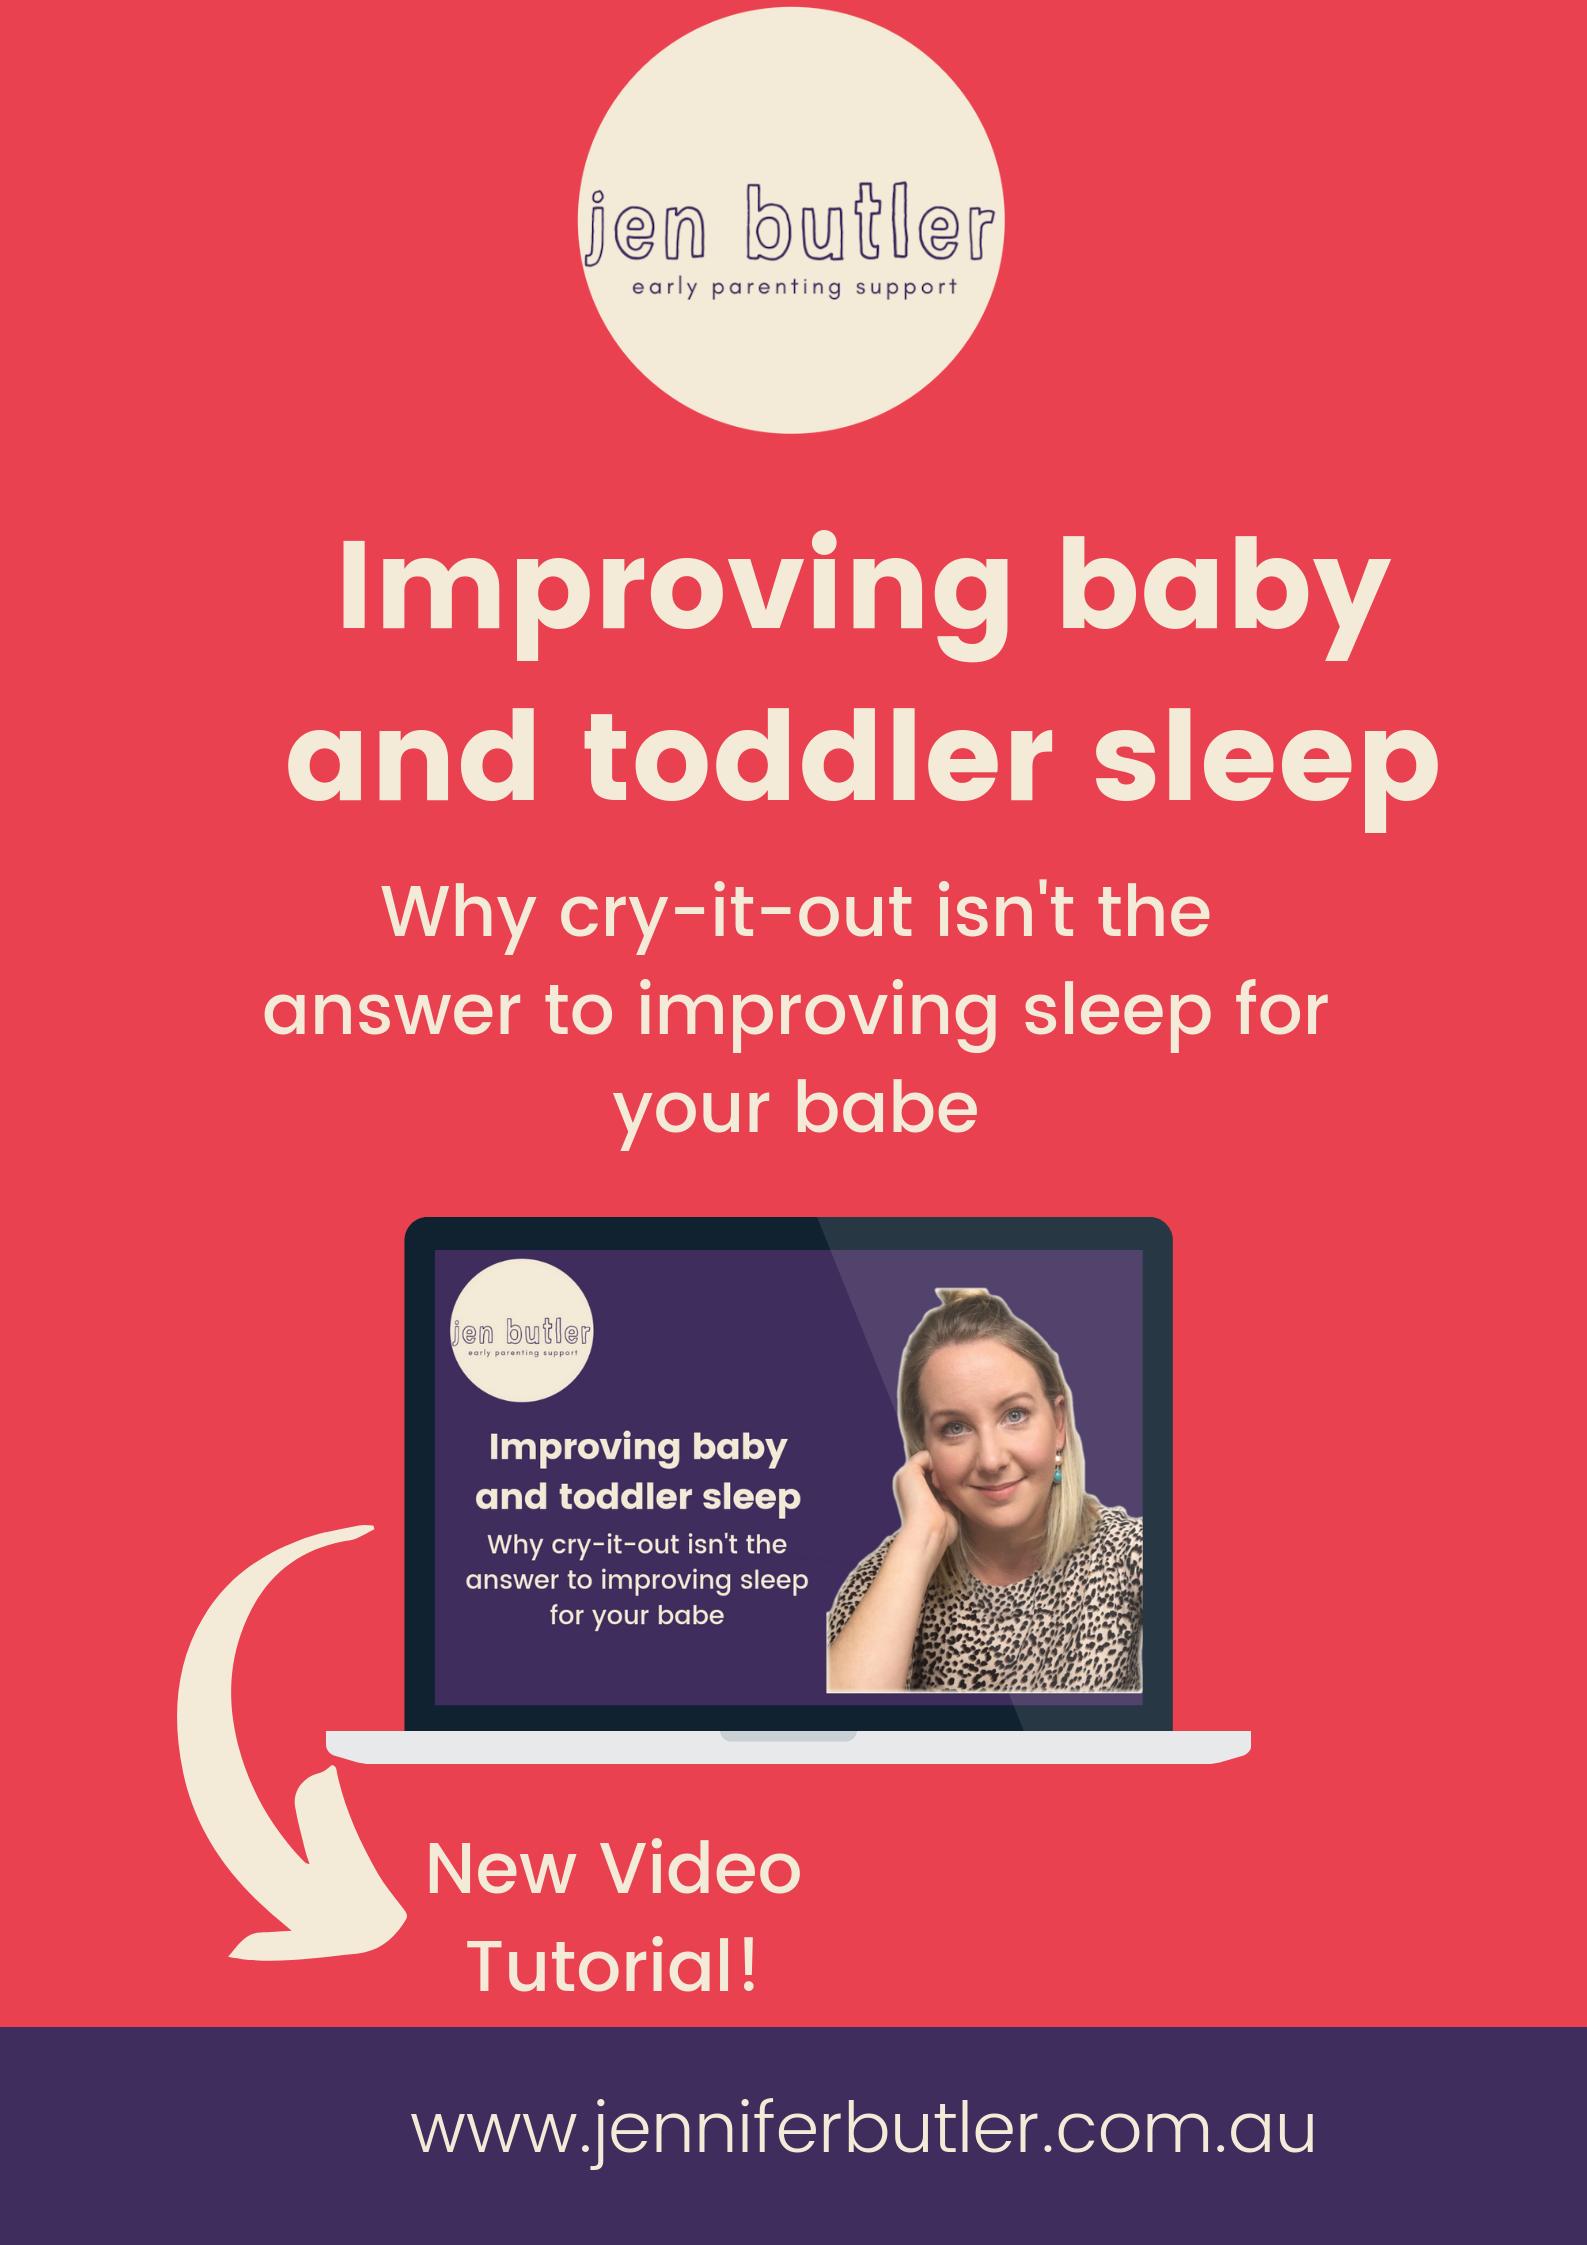 How to increase milk supply- milk supply - breastfeeding a newborn - I have no breast milk